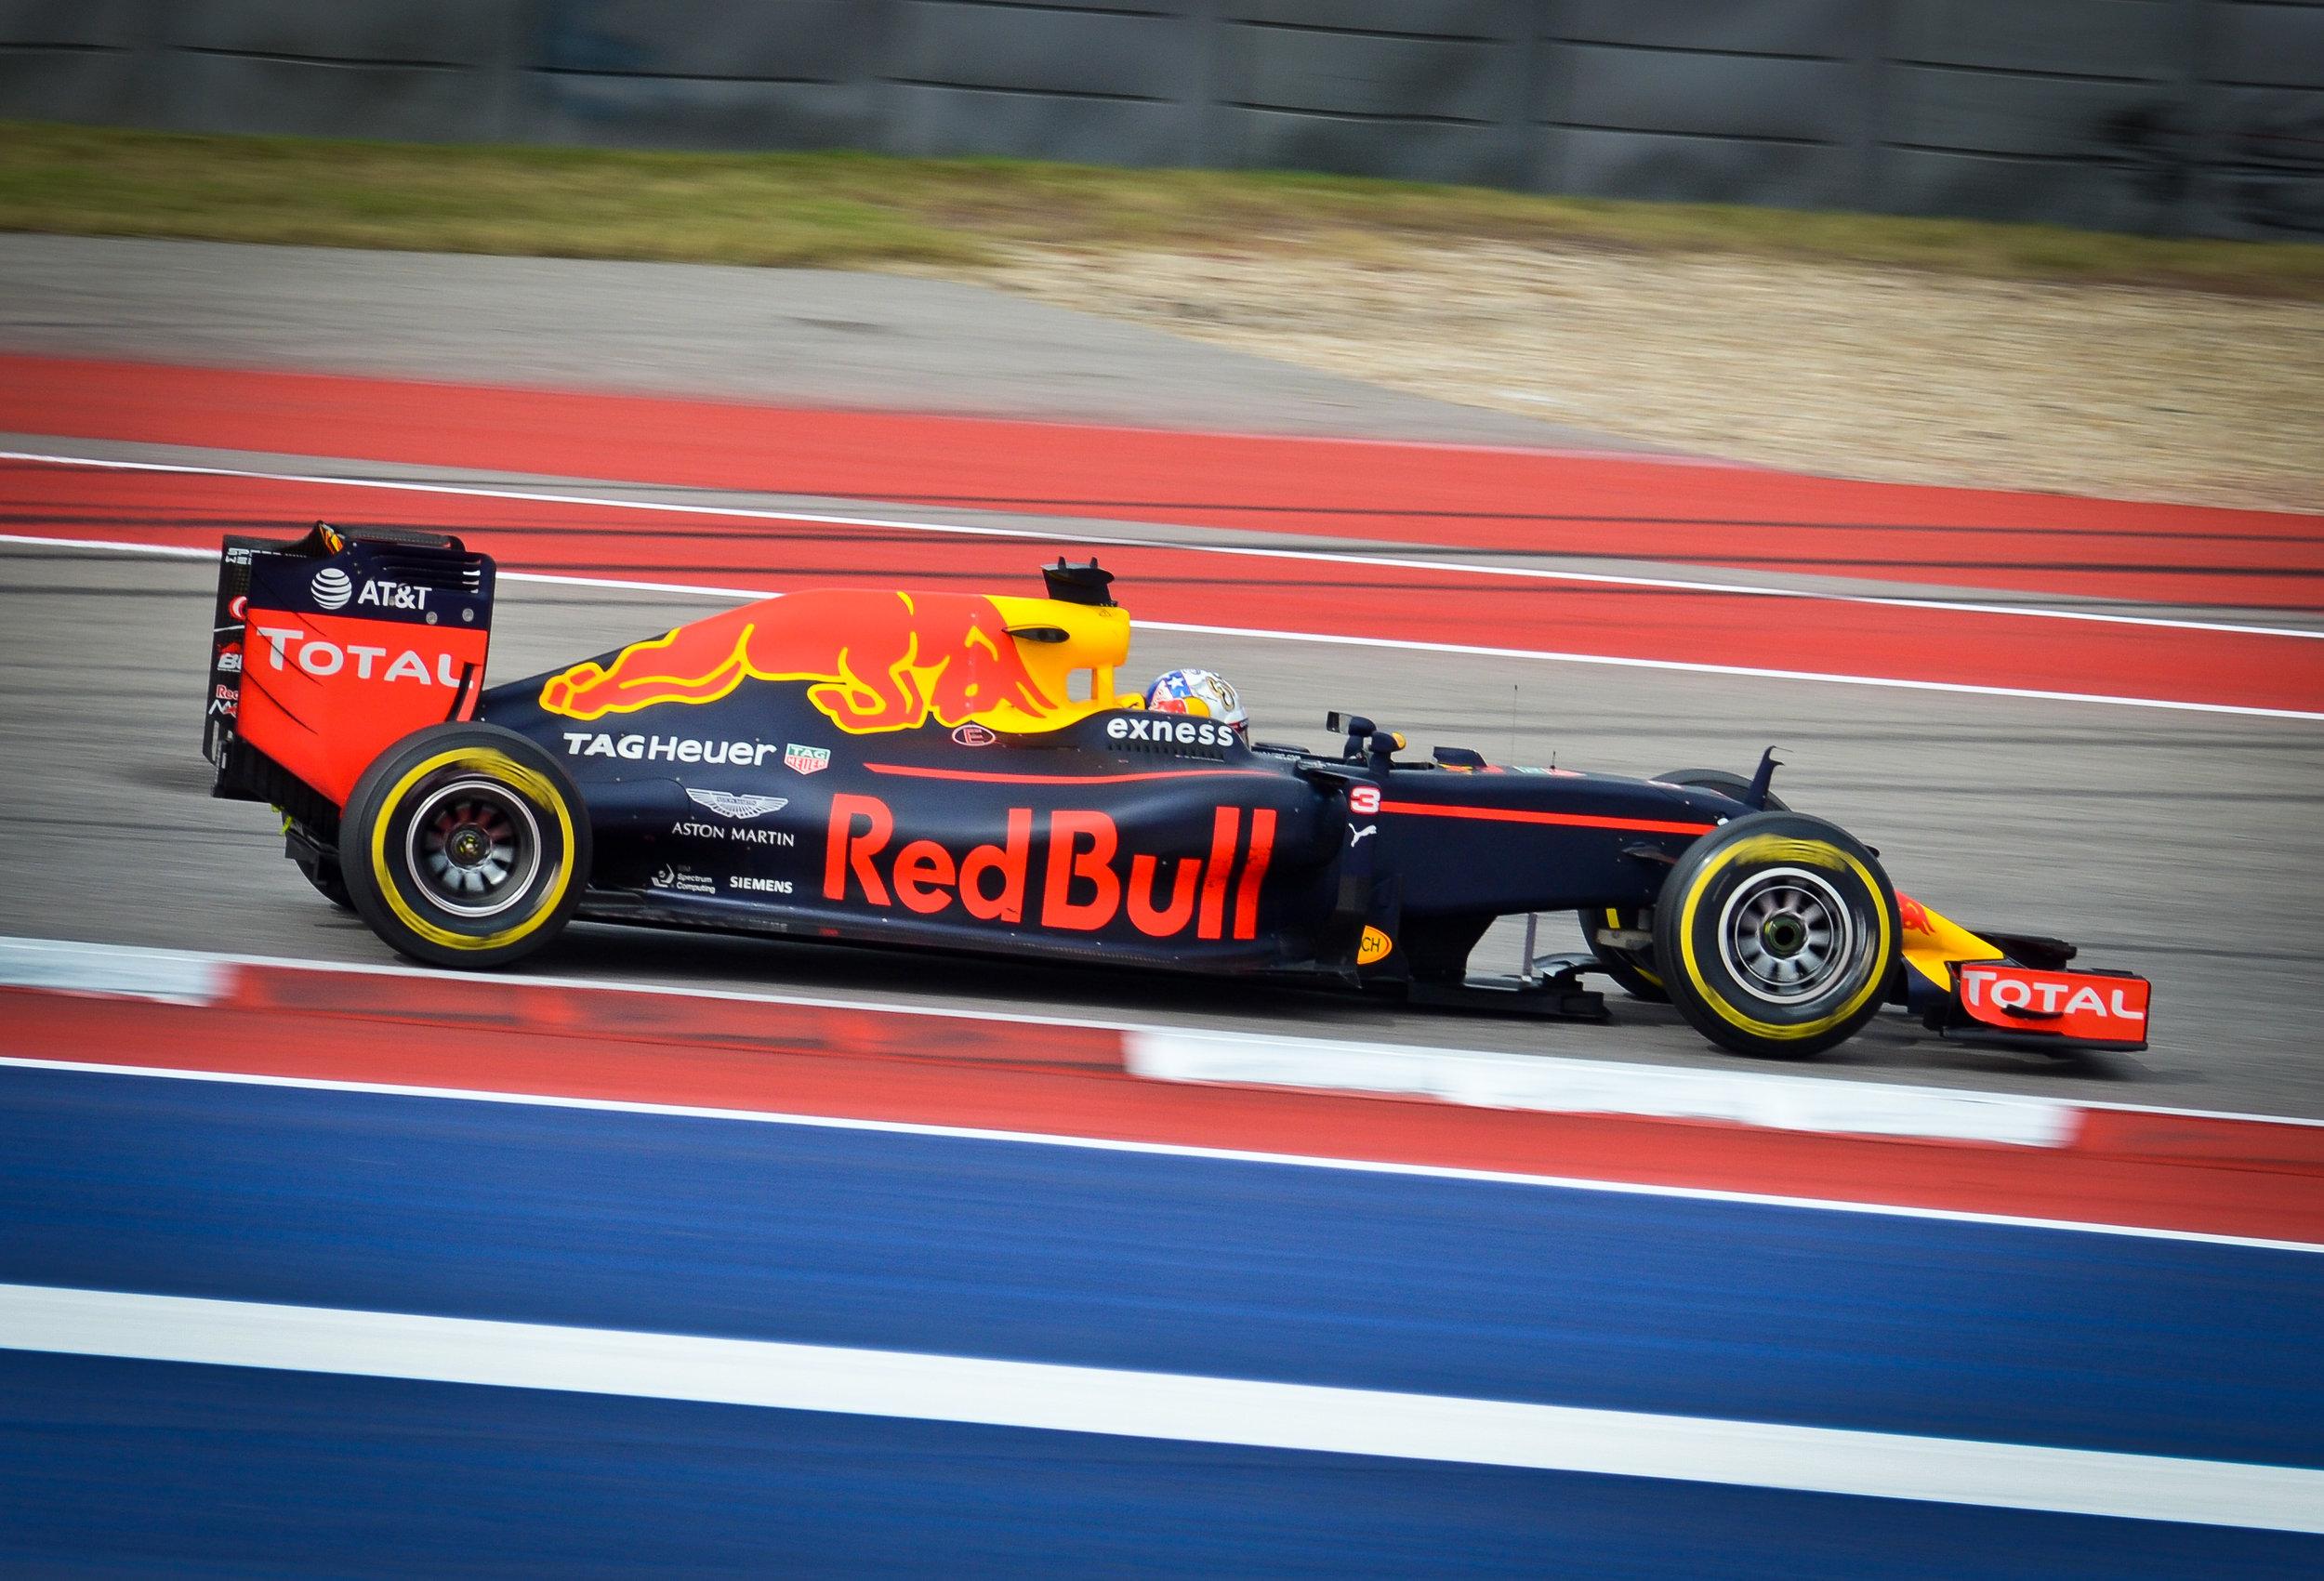 Daniel Ricciardo at the Circuit of the Americas, October, 2016